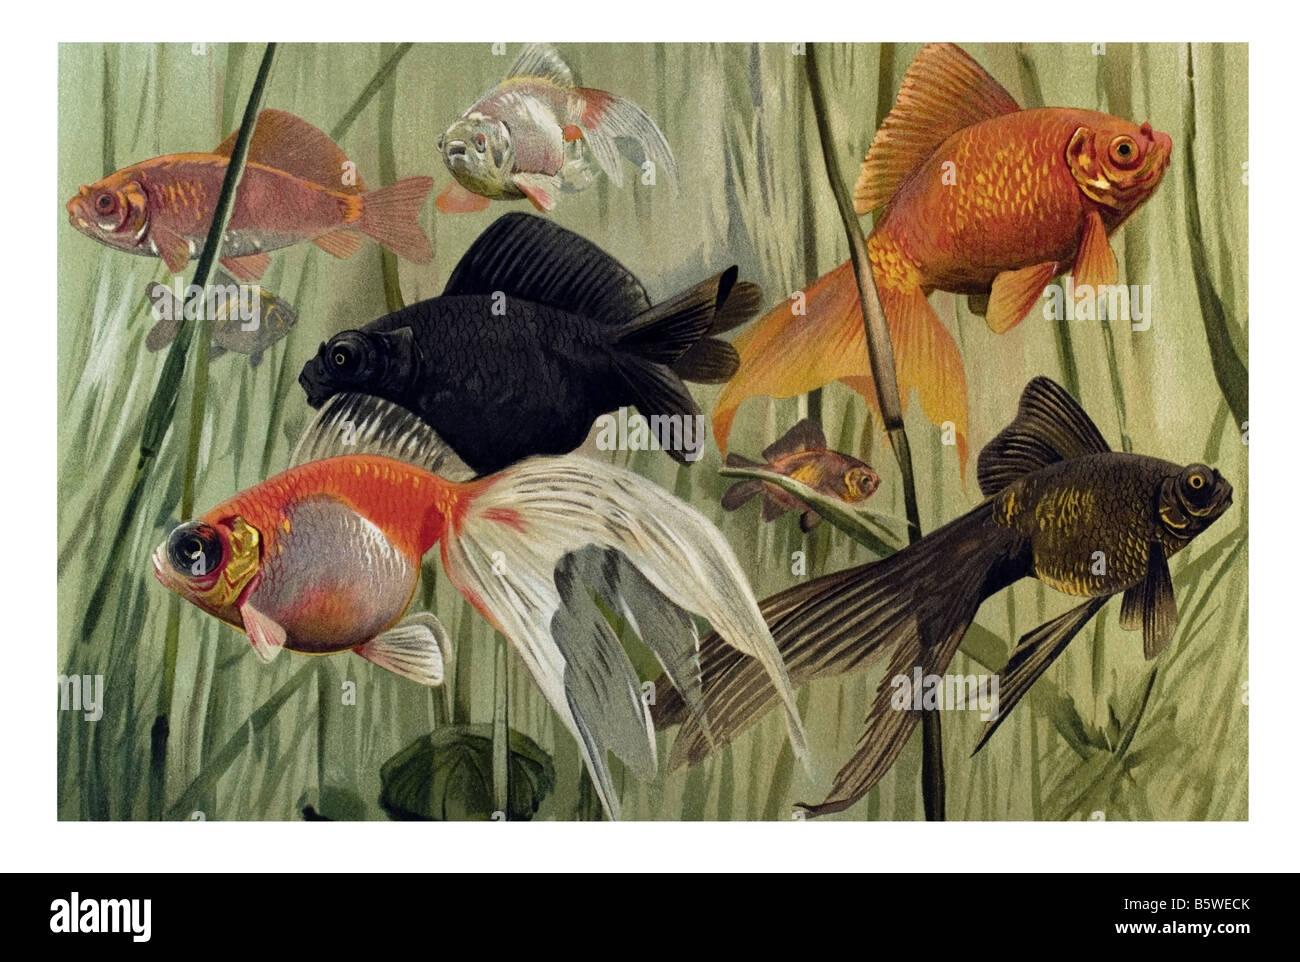 Goldfish, Carassius auratus domesticated fish aquarium fish water garden fish carp family Cyprinidae Stock Photo